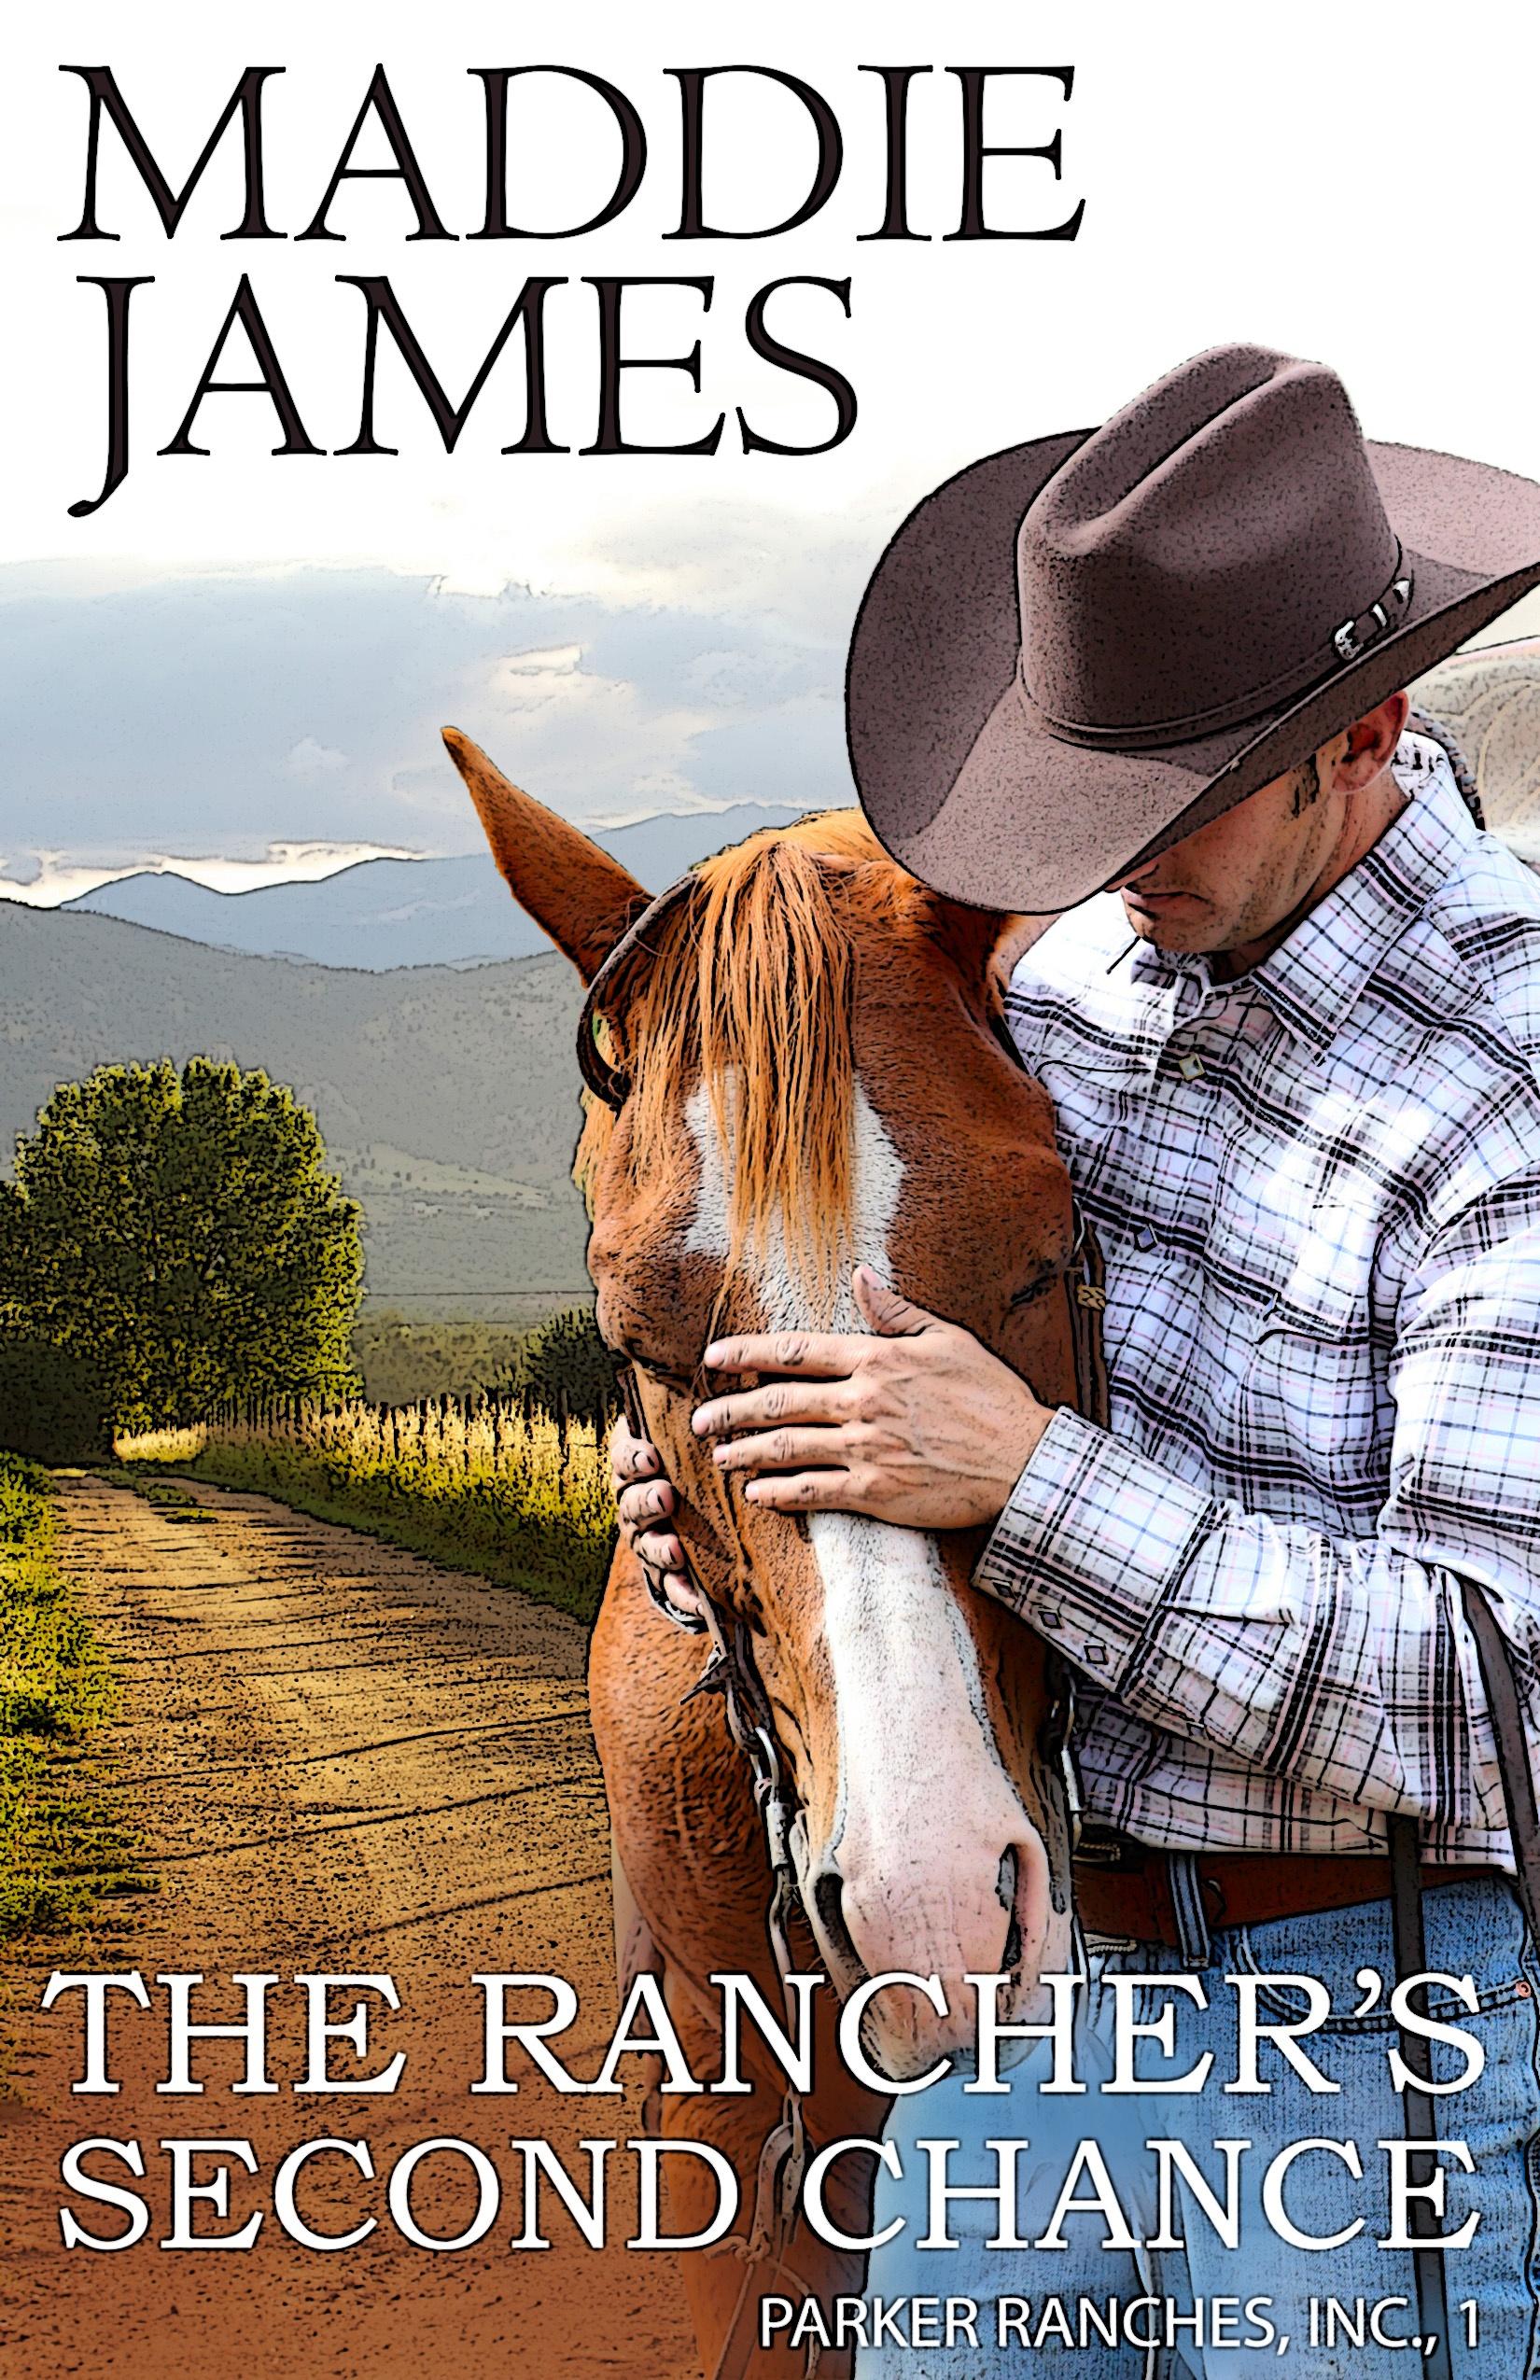 Ranchers-Second-Chance-PRI.jpg